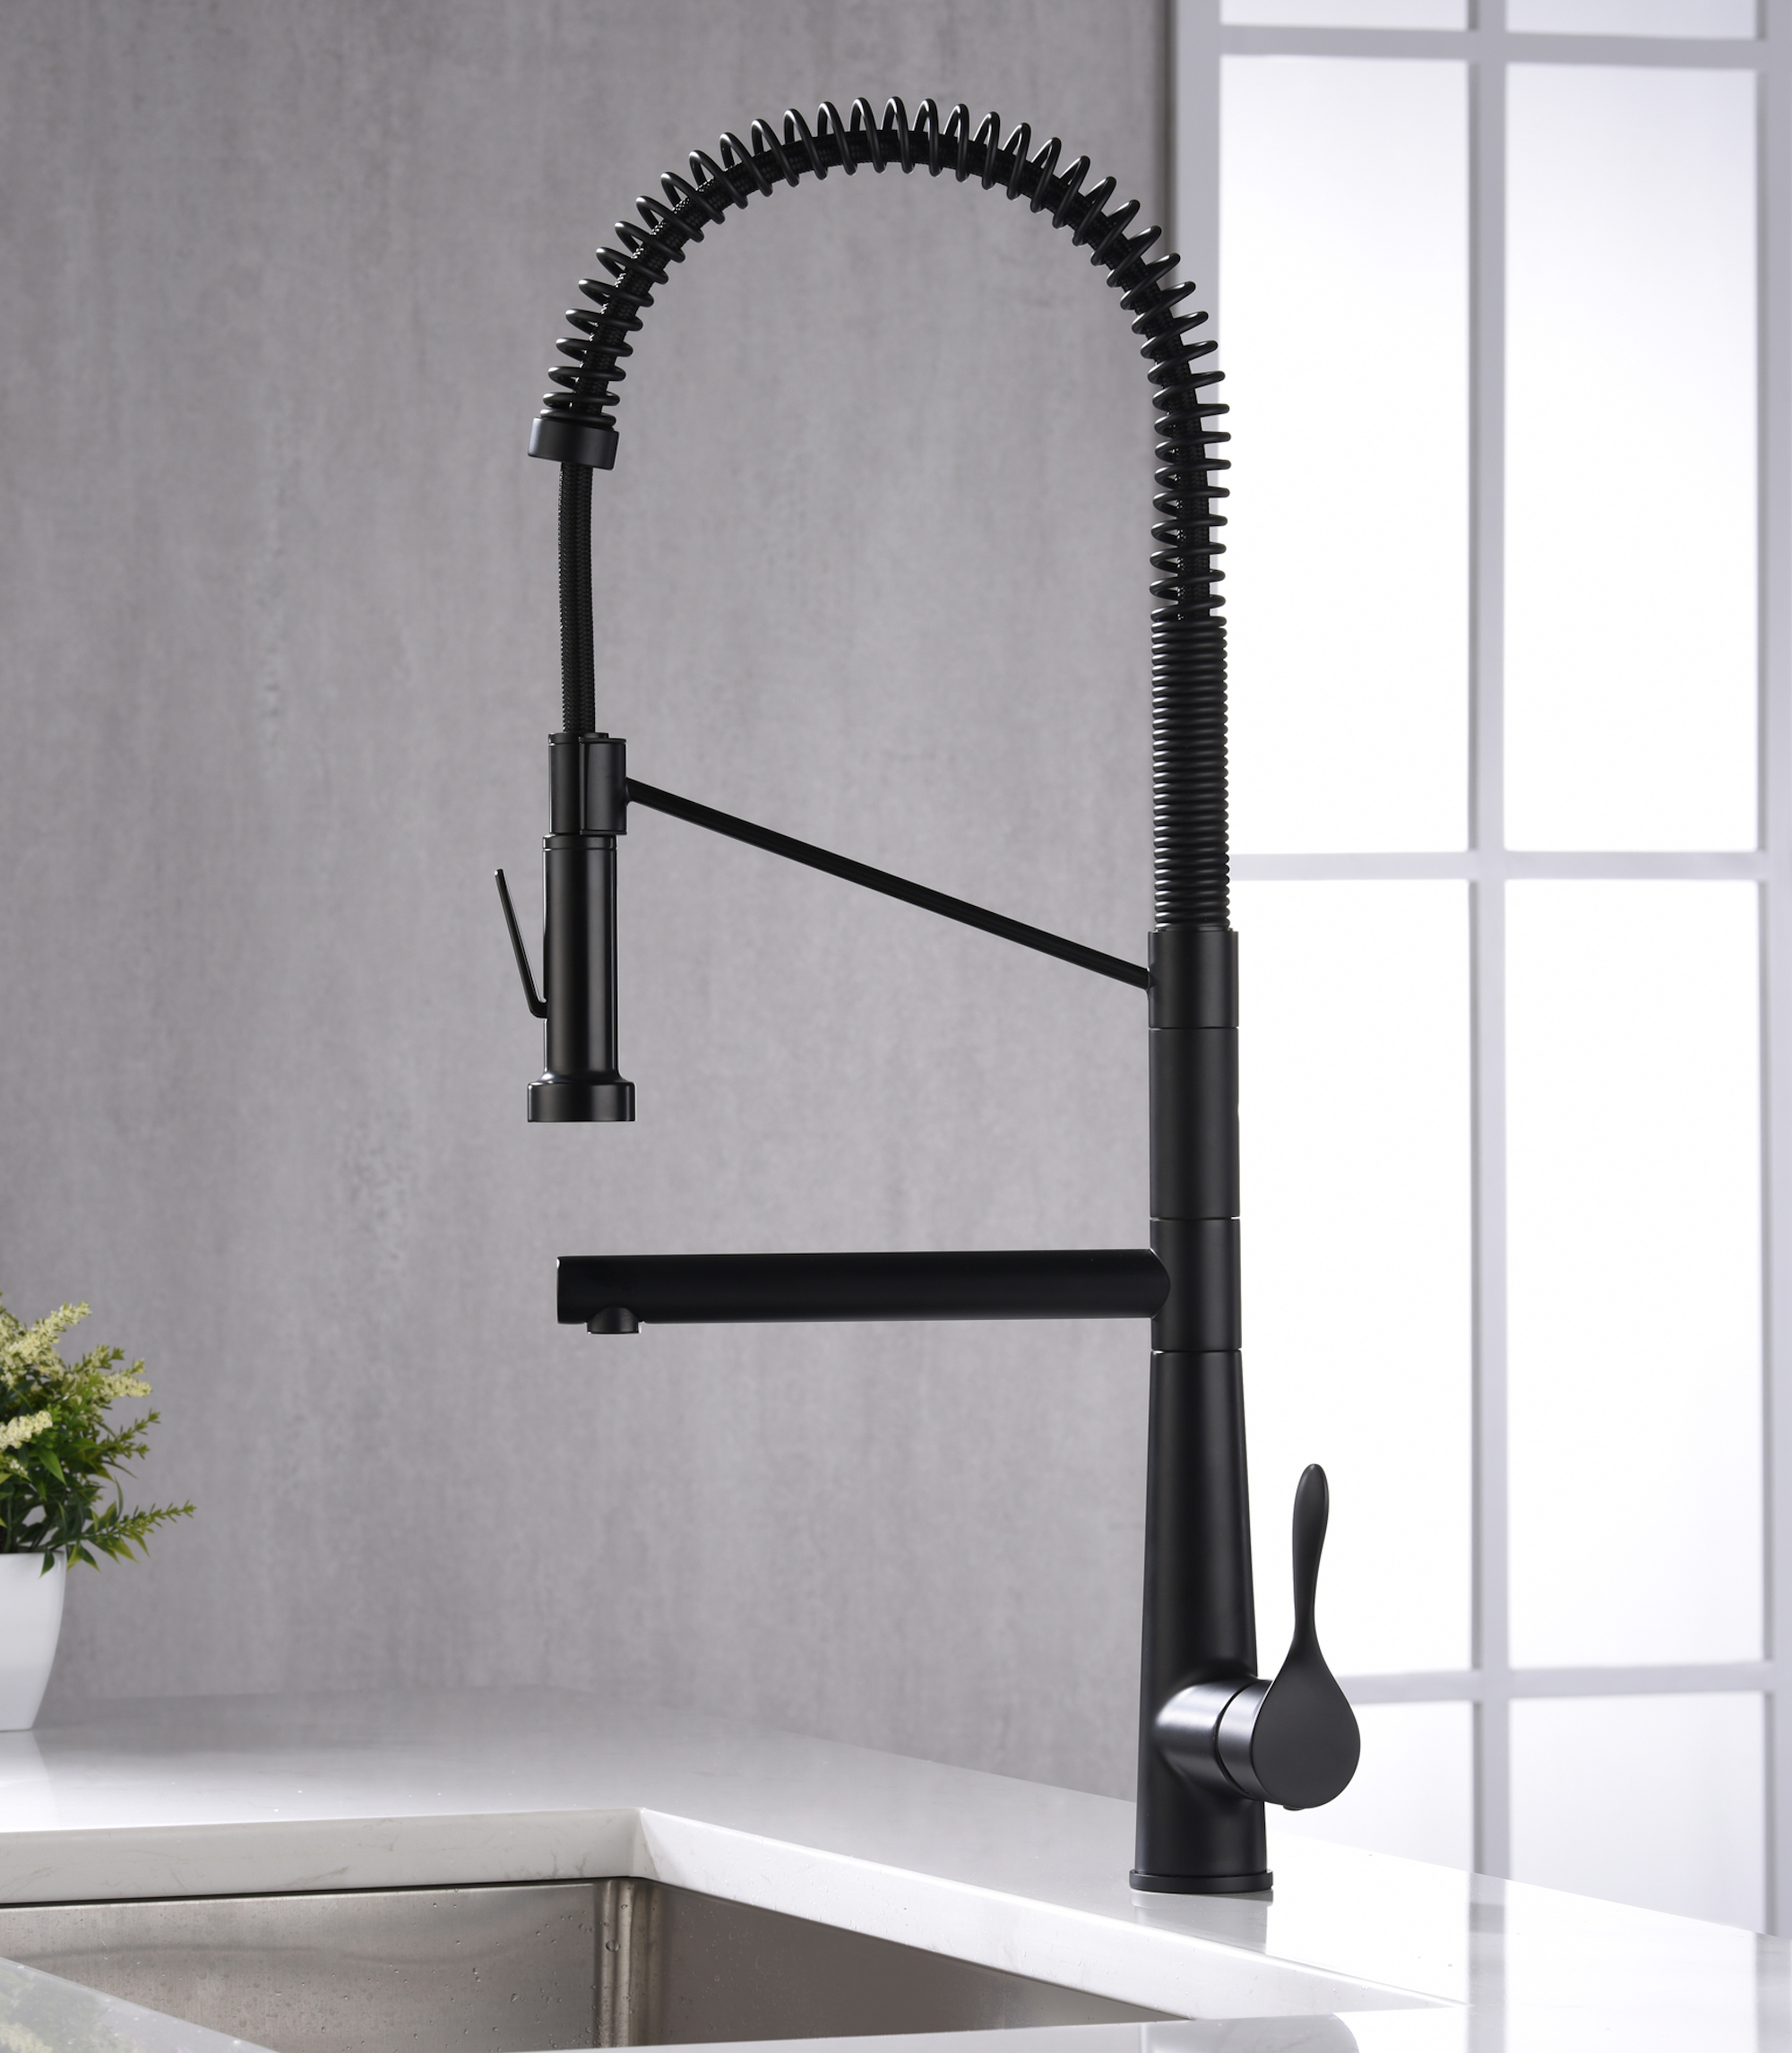 Karran Tumba Single Lever Handle Lead-free Brass ADA Kitchen Faucet, Pull Down, Matte Black, KKF230MB